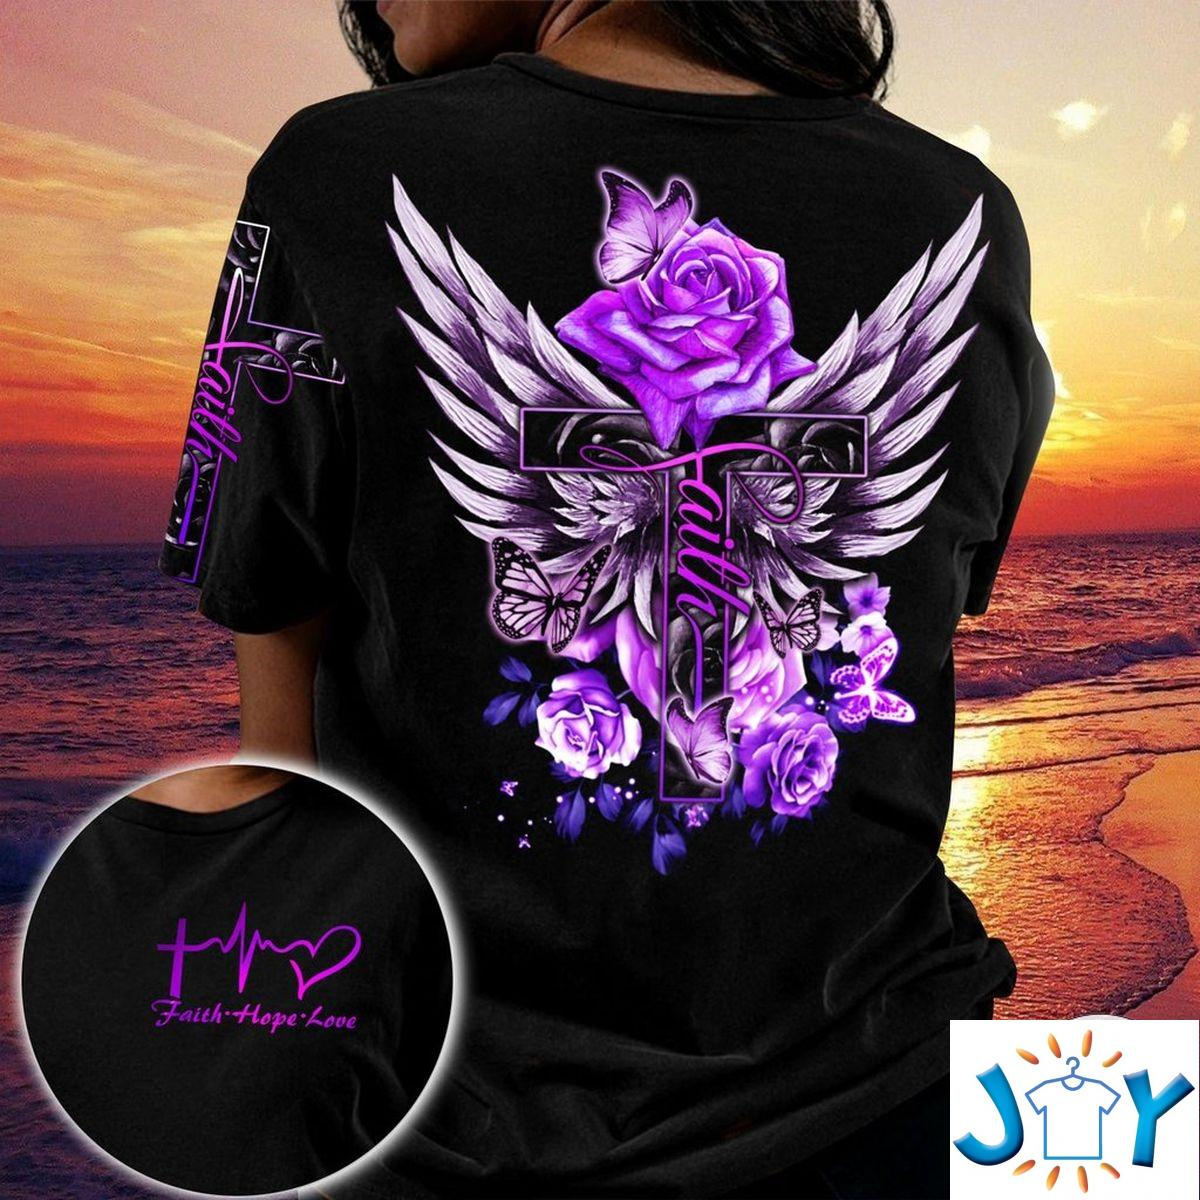 Purple Rose Faith Hope Love Jesus 3D All Over Print T-Shirt, Hoodie